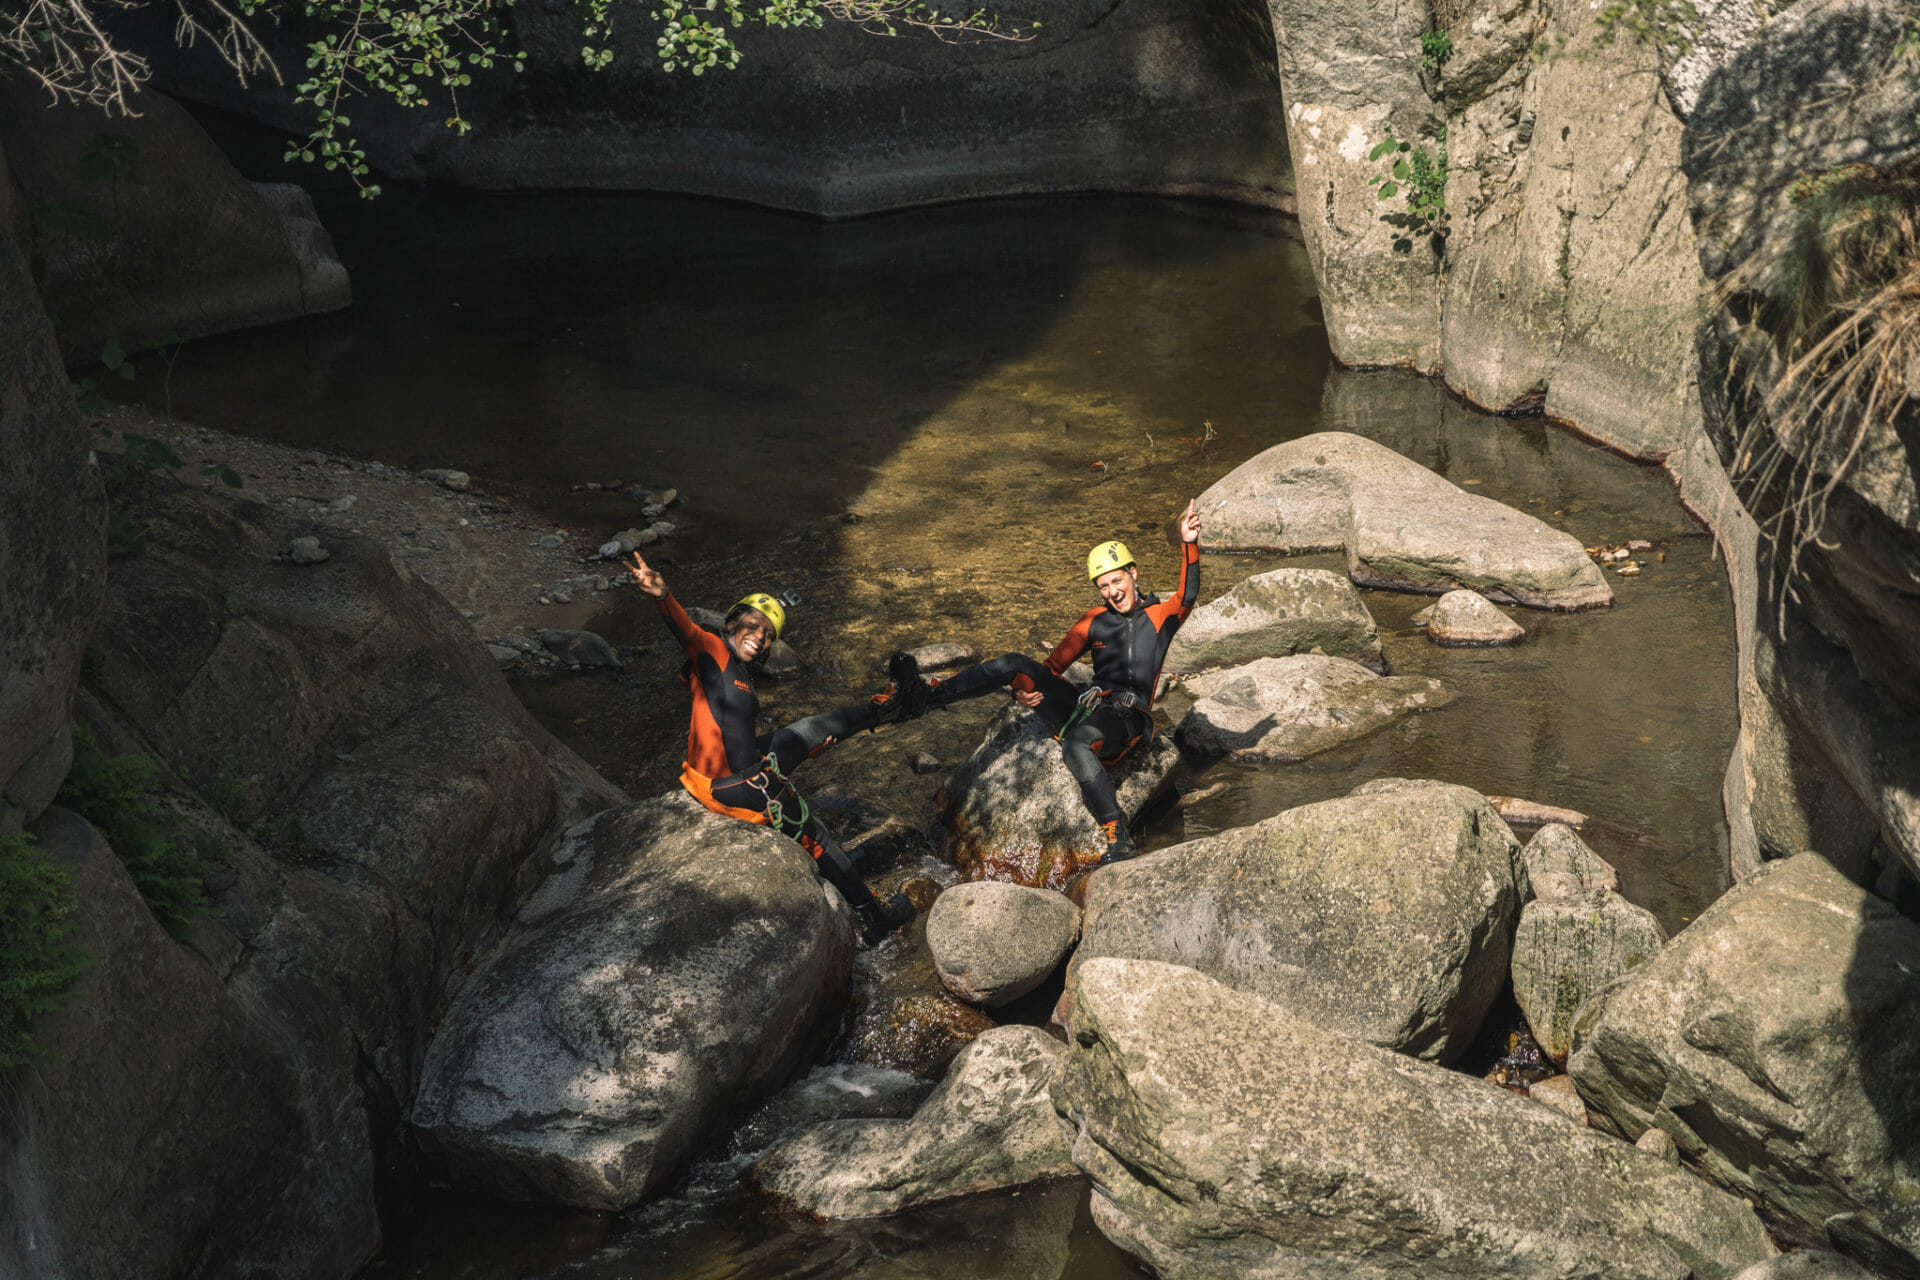 activité-exterieur-nature-canyoning